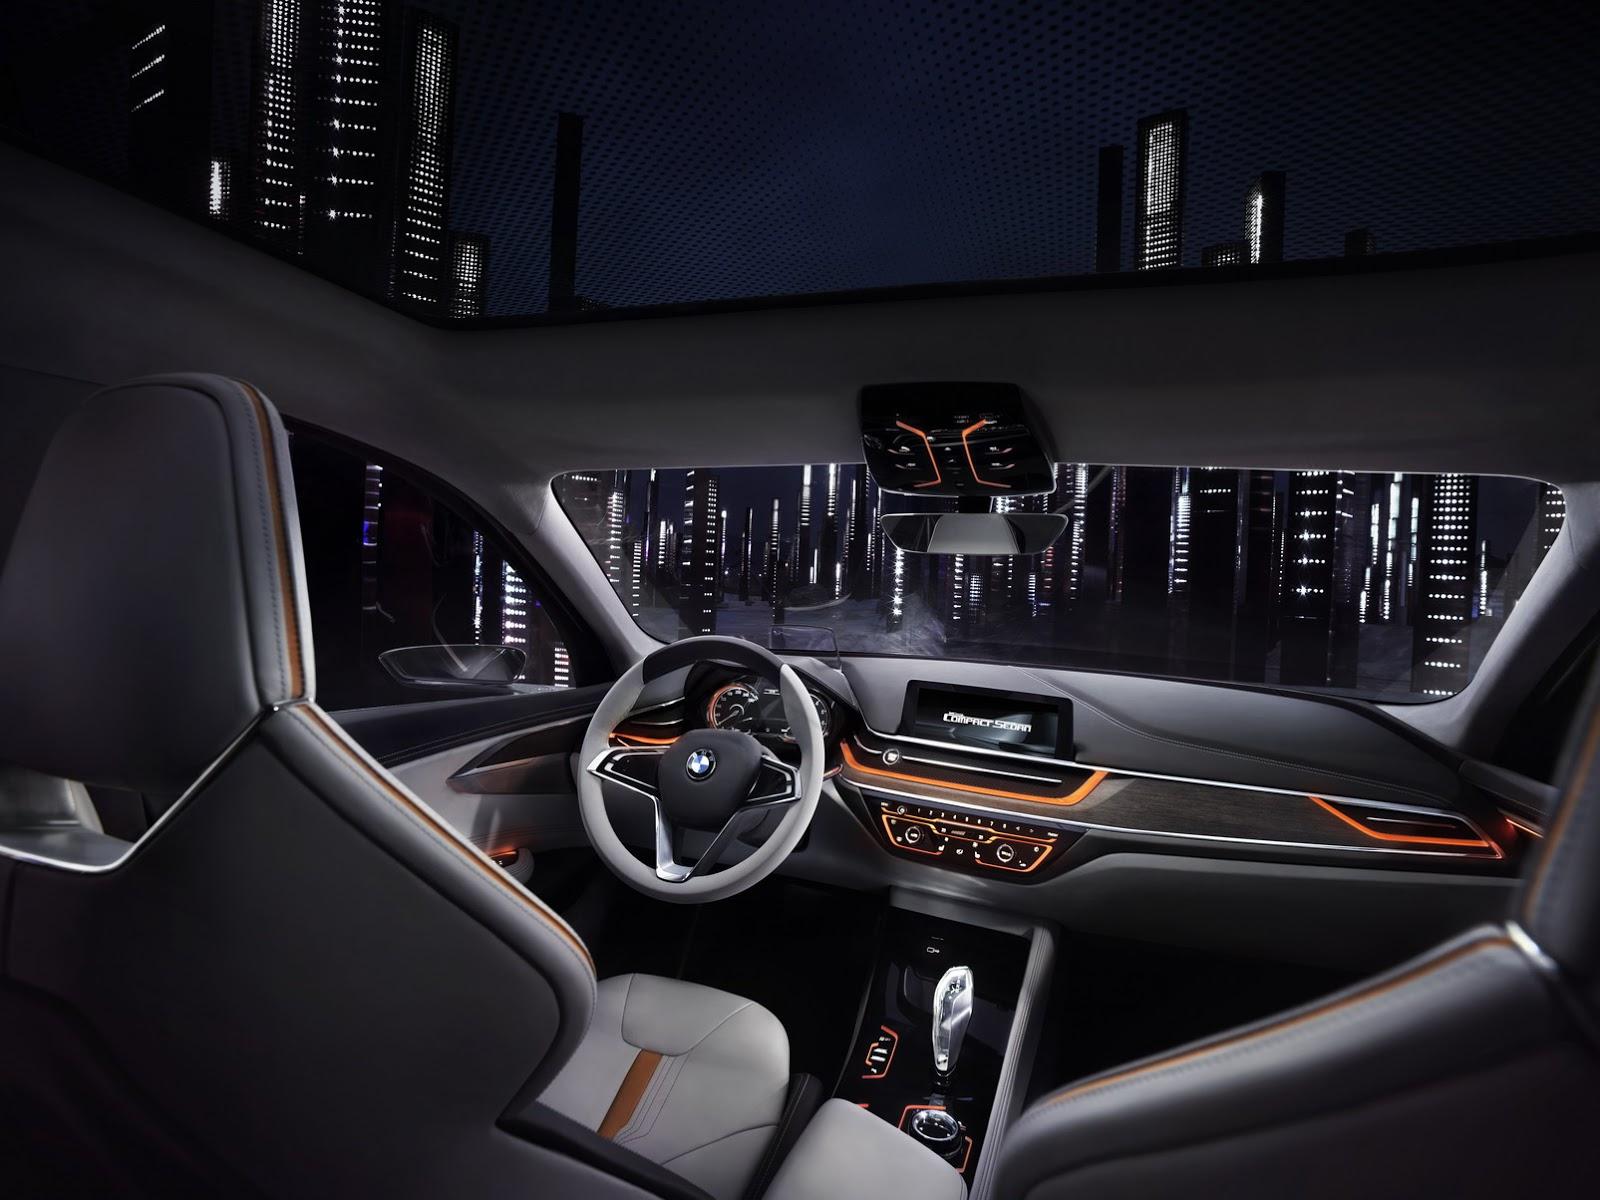 BMW-Compact-Sedan-Concept-11